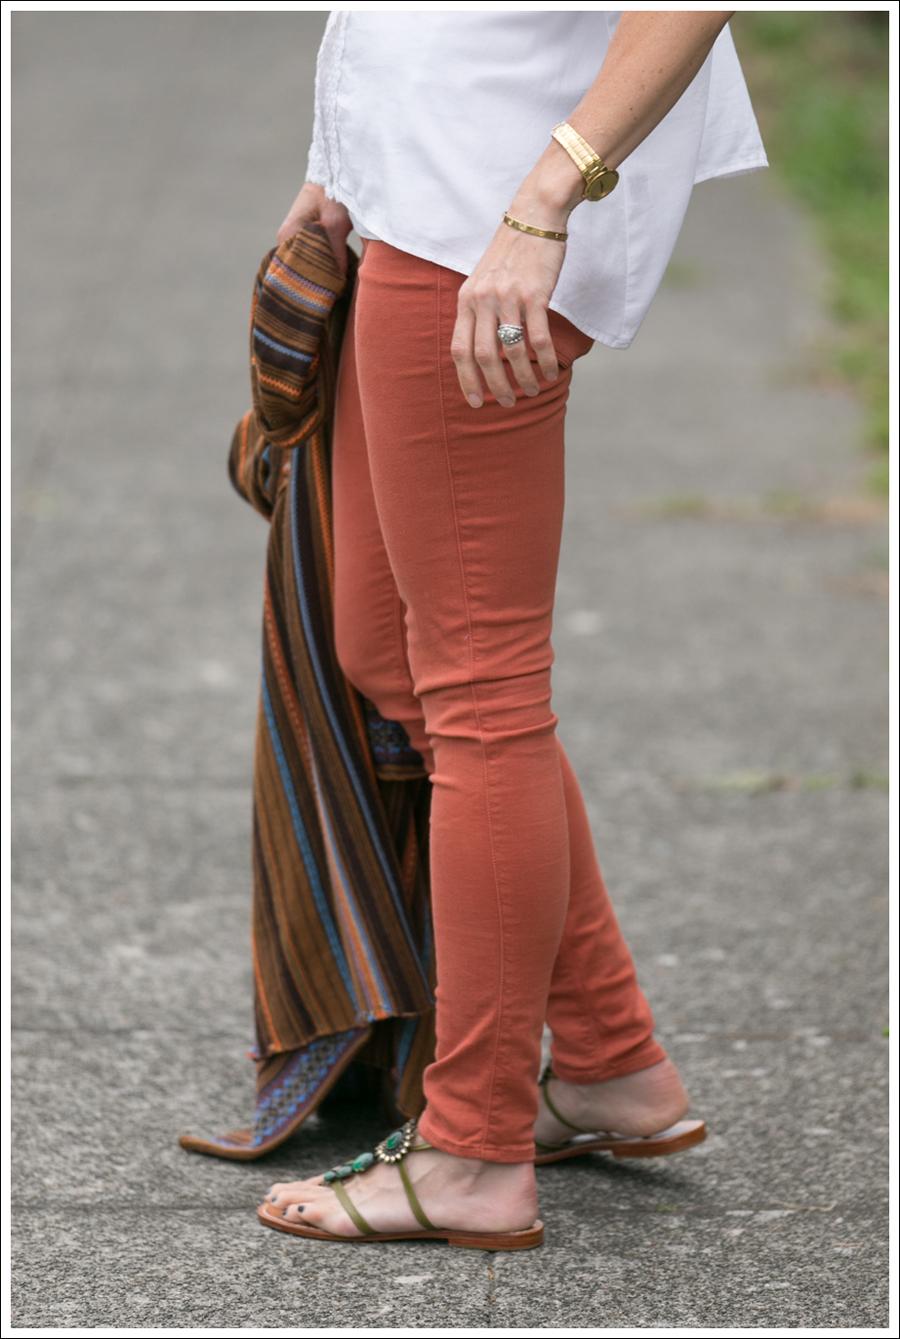 blogOrange Black Orchid Jeans White Top Pattern Swing Sweater-3